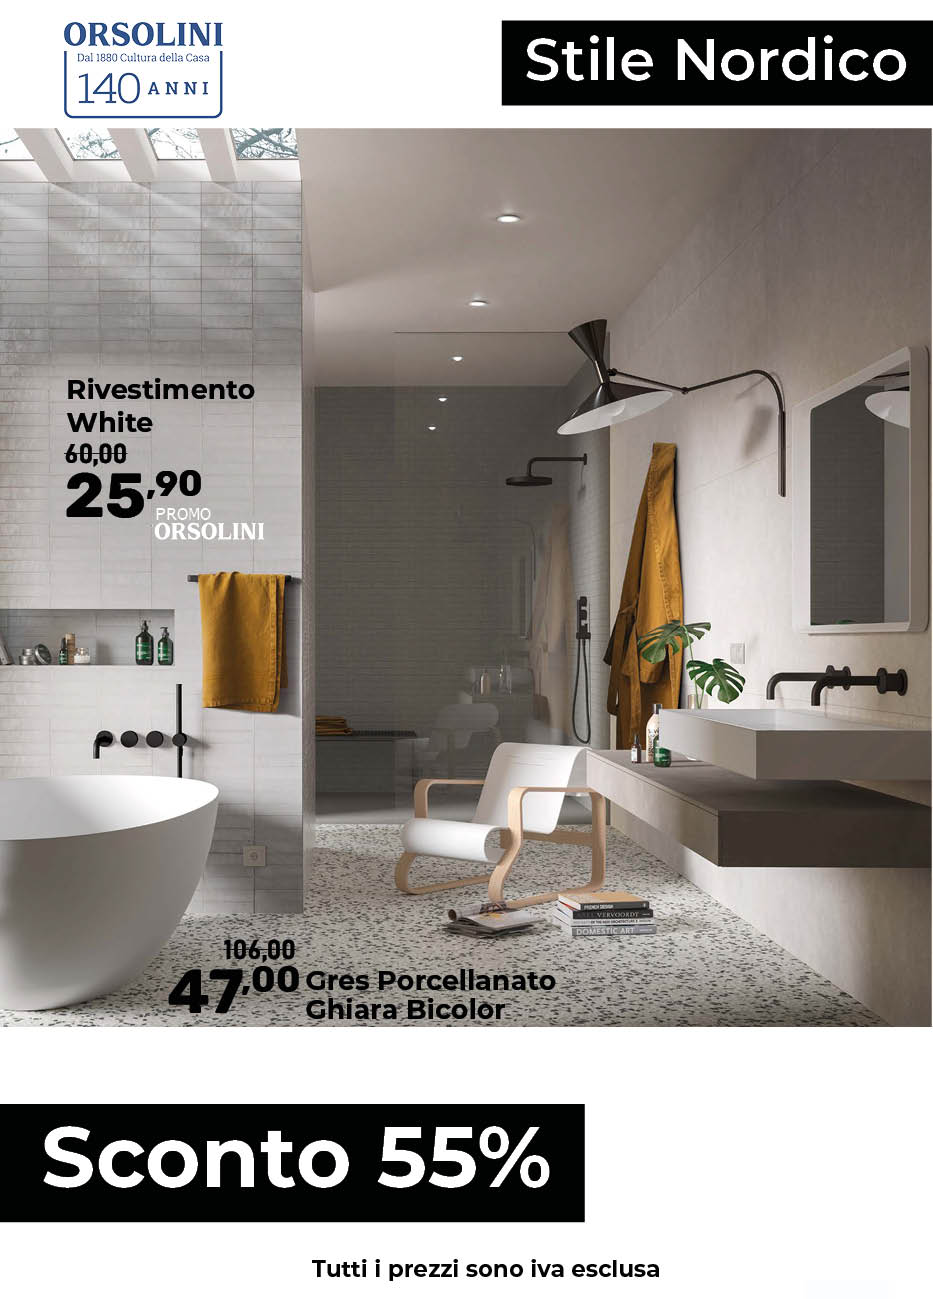 promo-bagno-01-2021-total-look-03